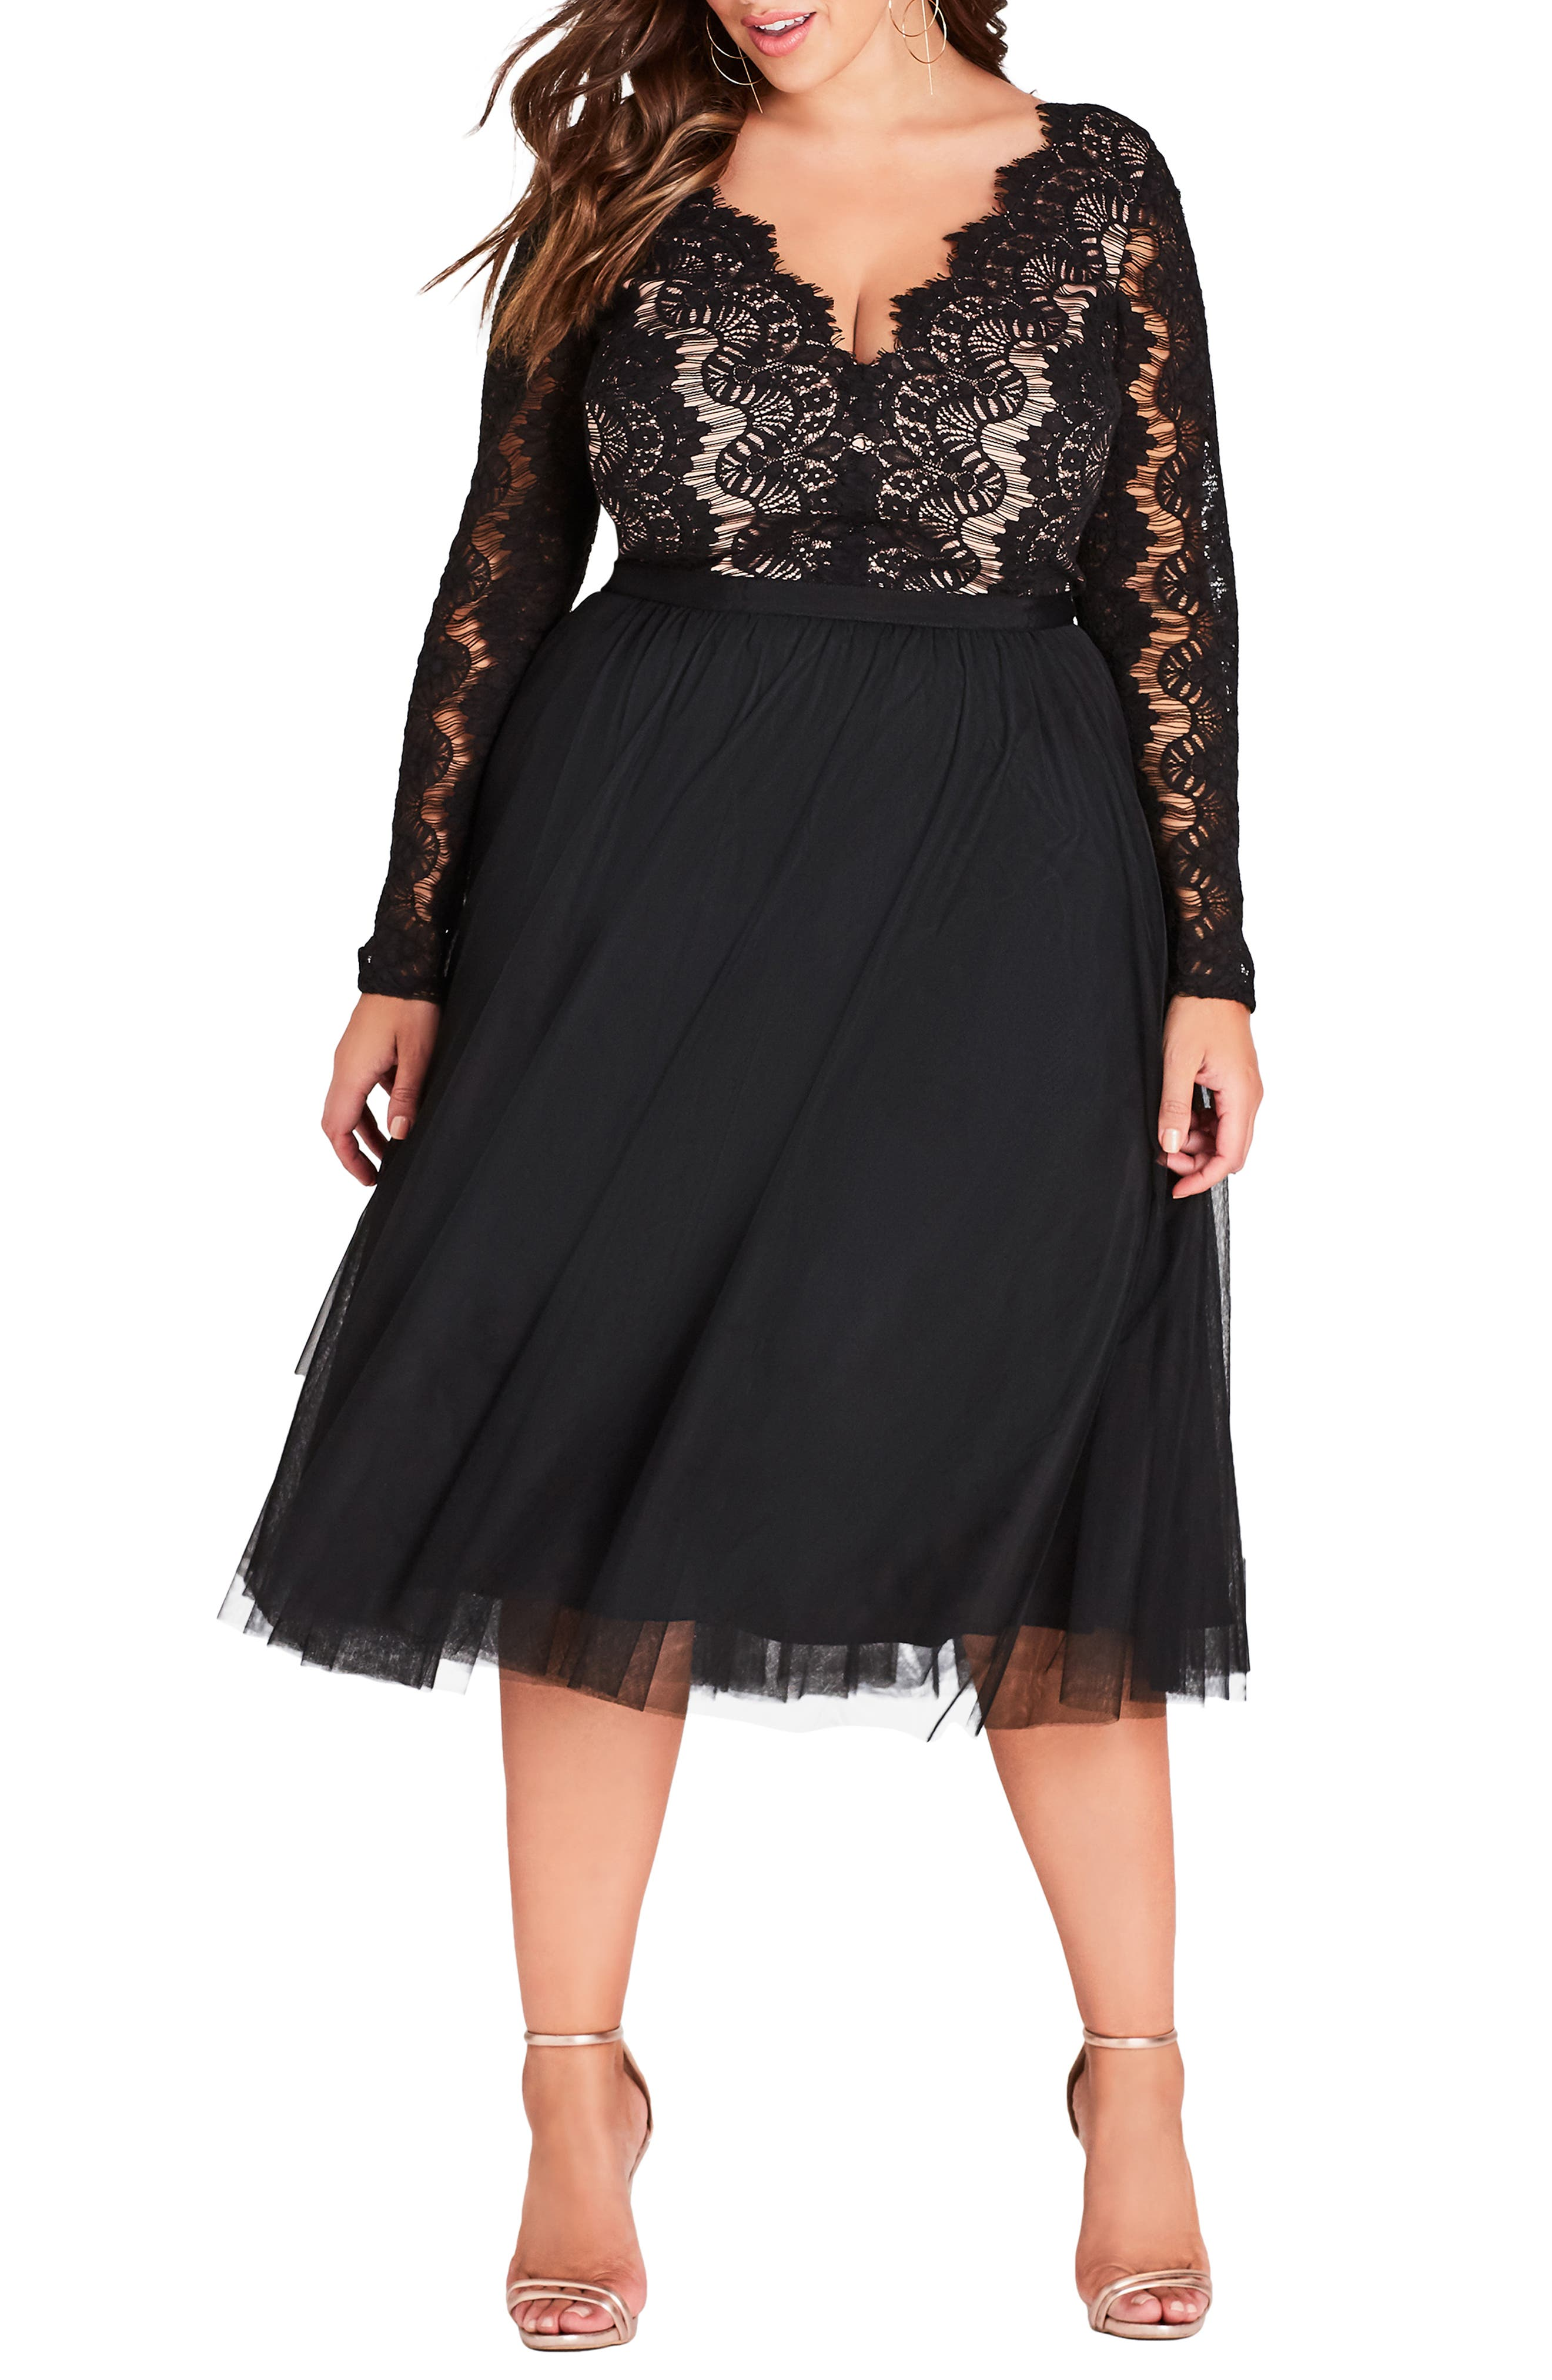 67721319804e0 Plus-Size Dresses | Nordstrom